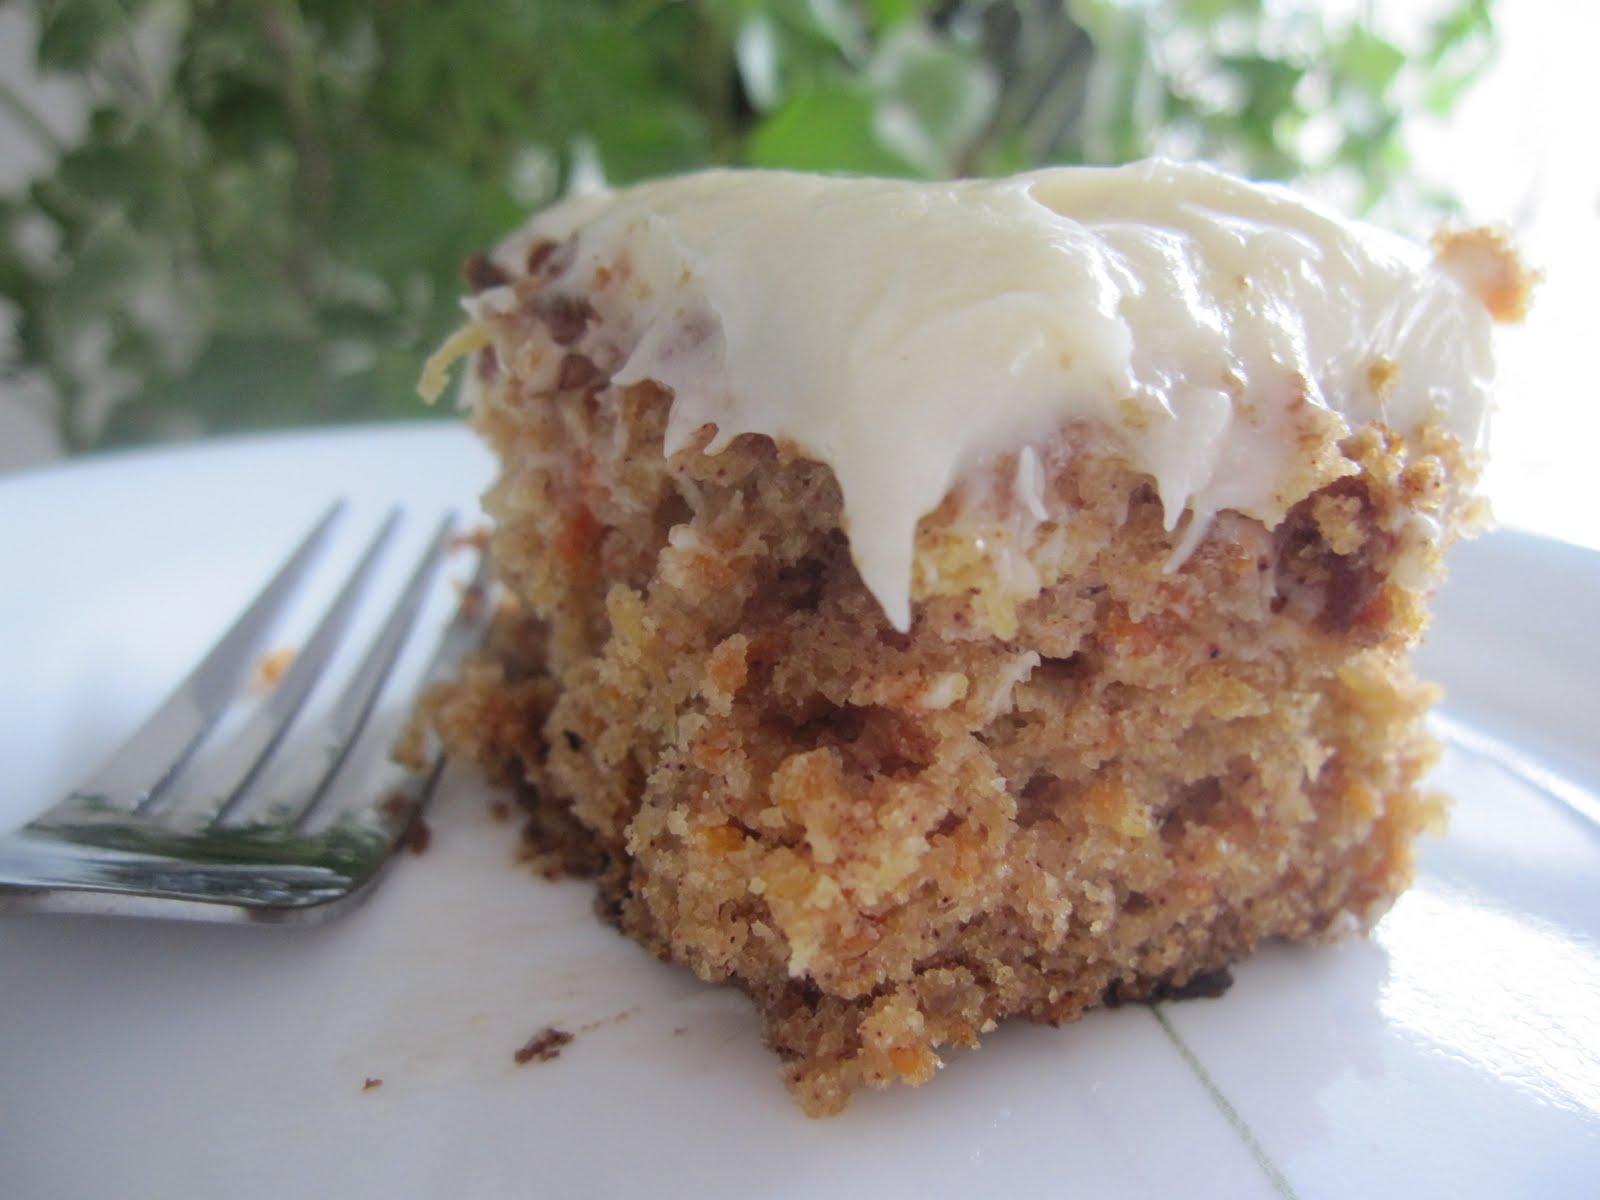 Mennonite Girls Can Cook: Pineapple Carrot Cake - Gluten Free